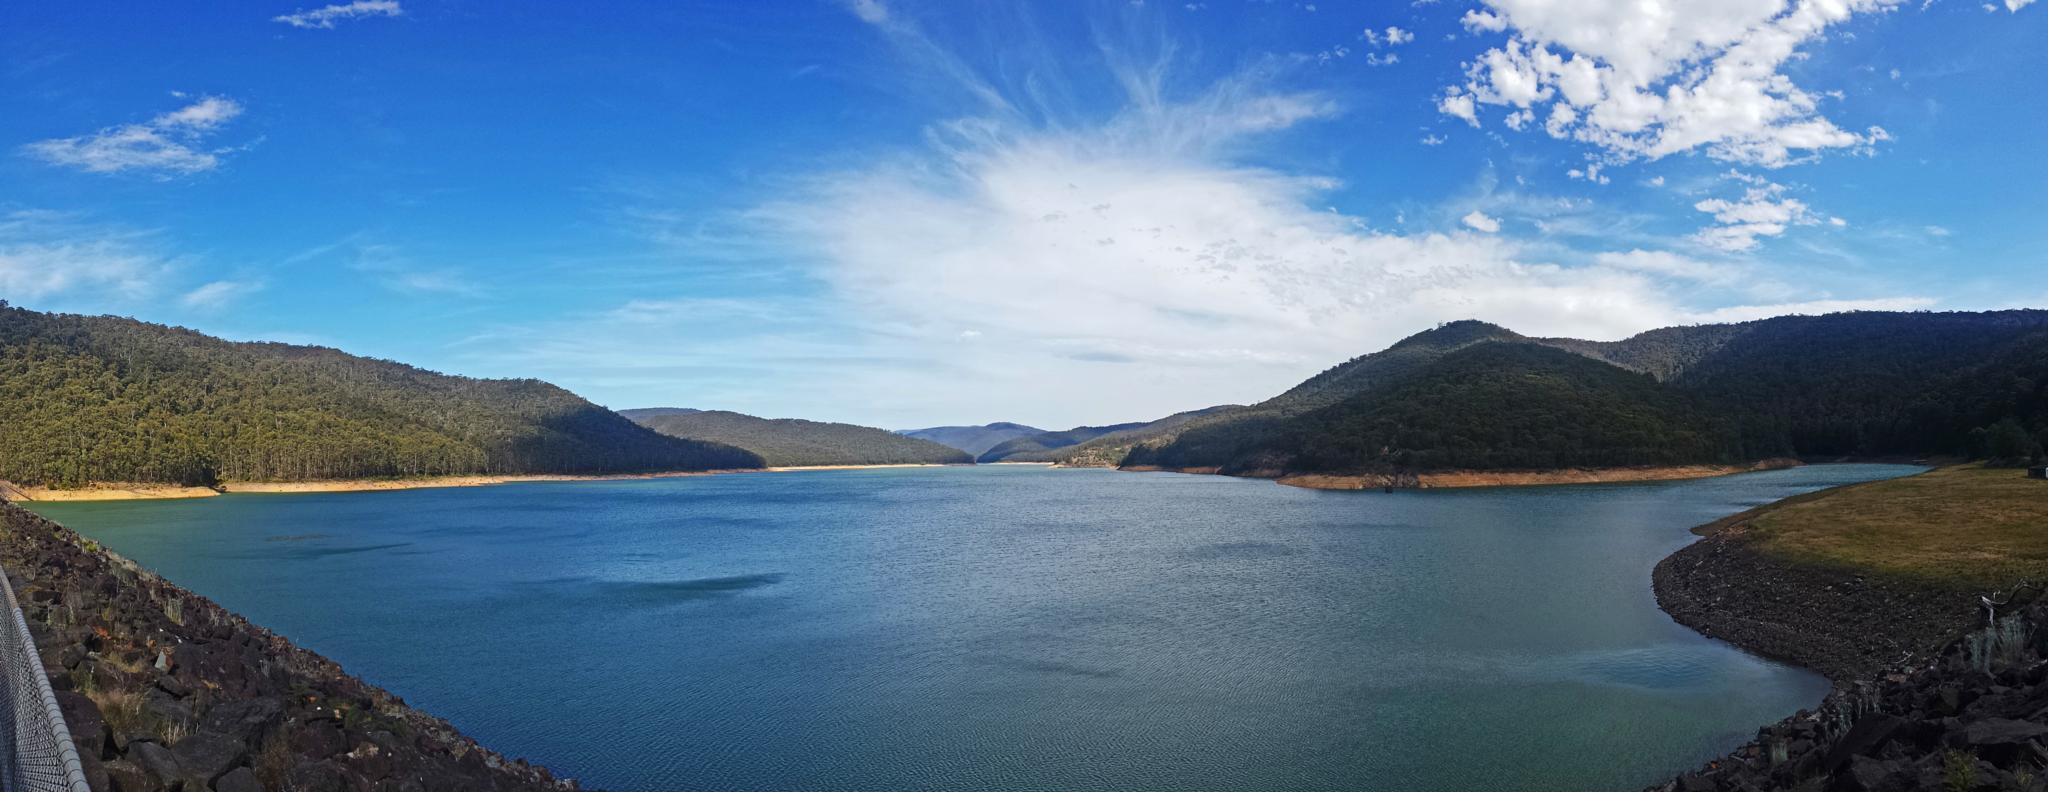 Upper Yarra Reservoir by Mark Vivian